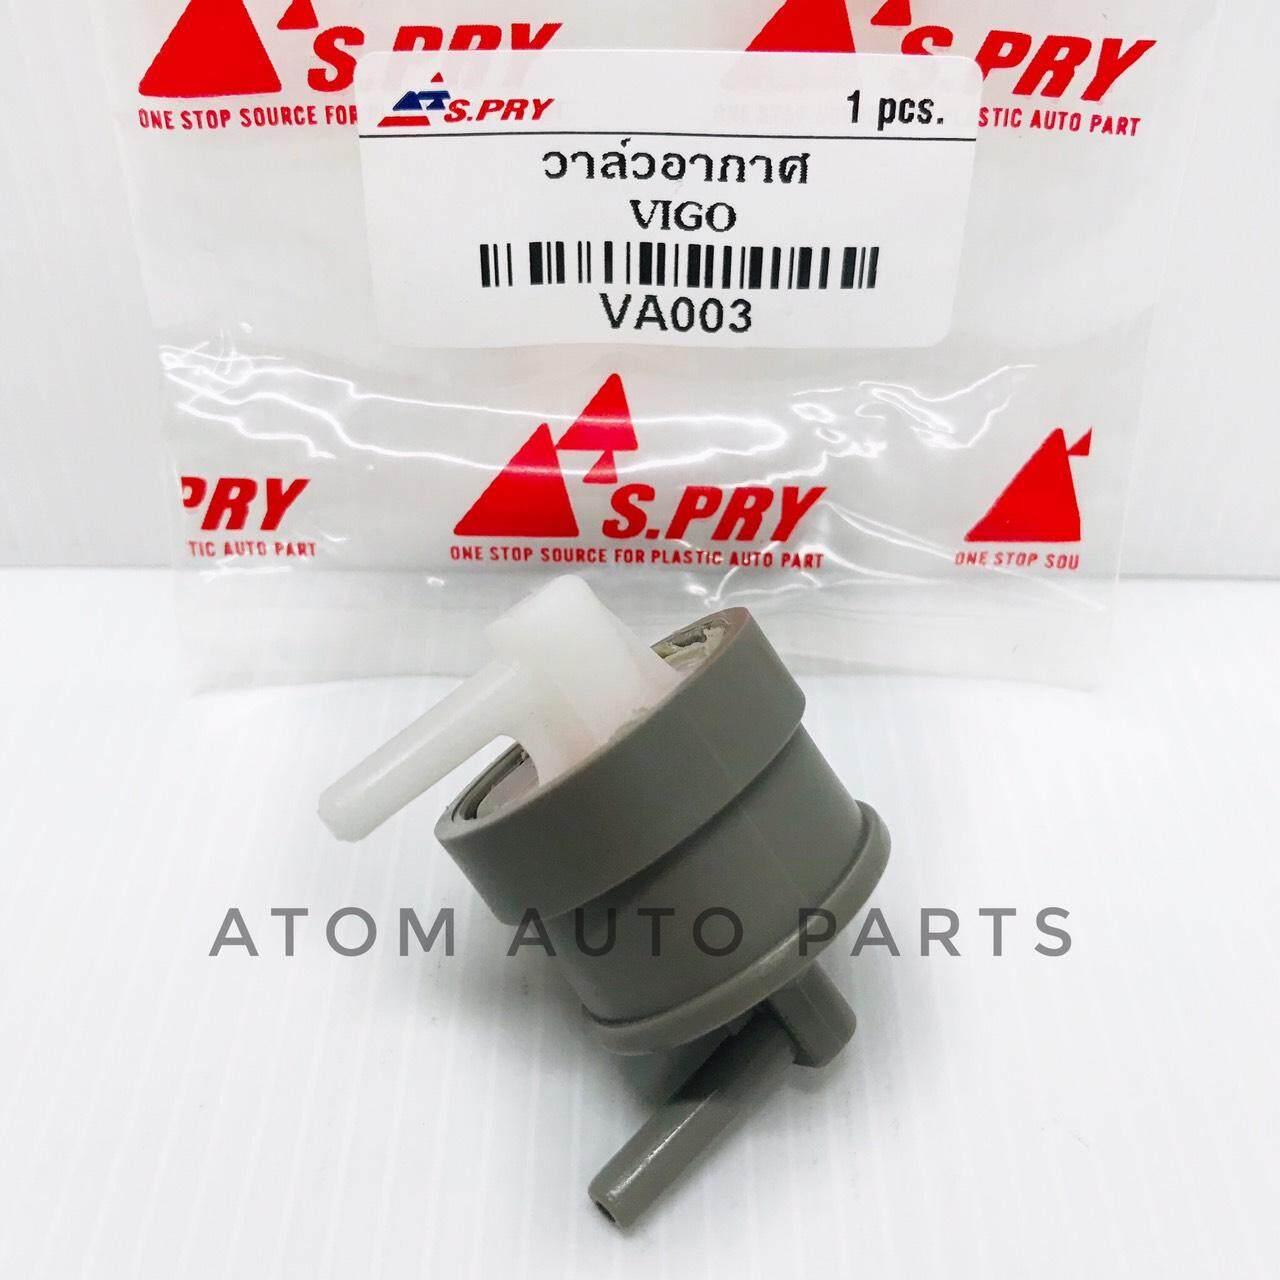 S.pry วาล์วอากาศ Vigo รหัส.va003 (90917-11036) By Atom Auto Parts.